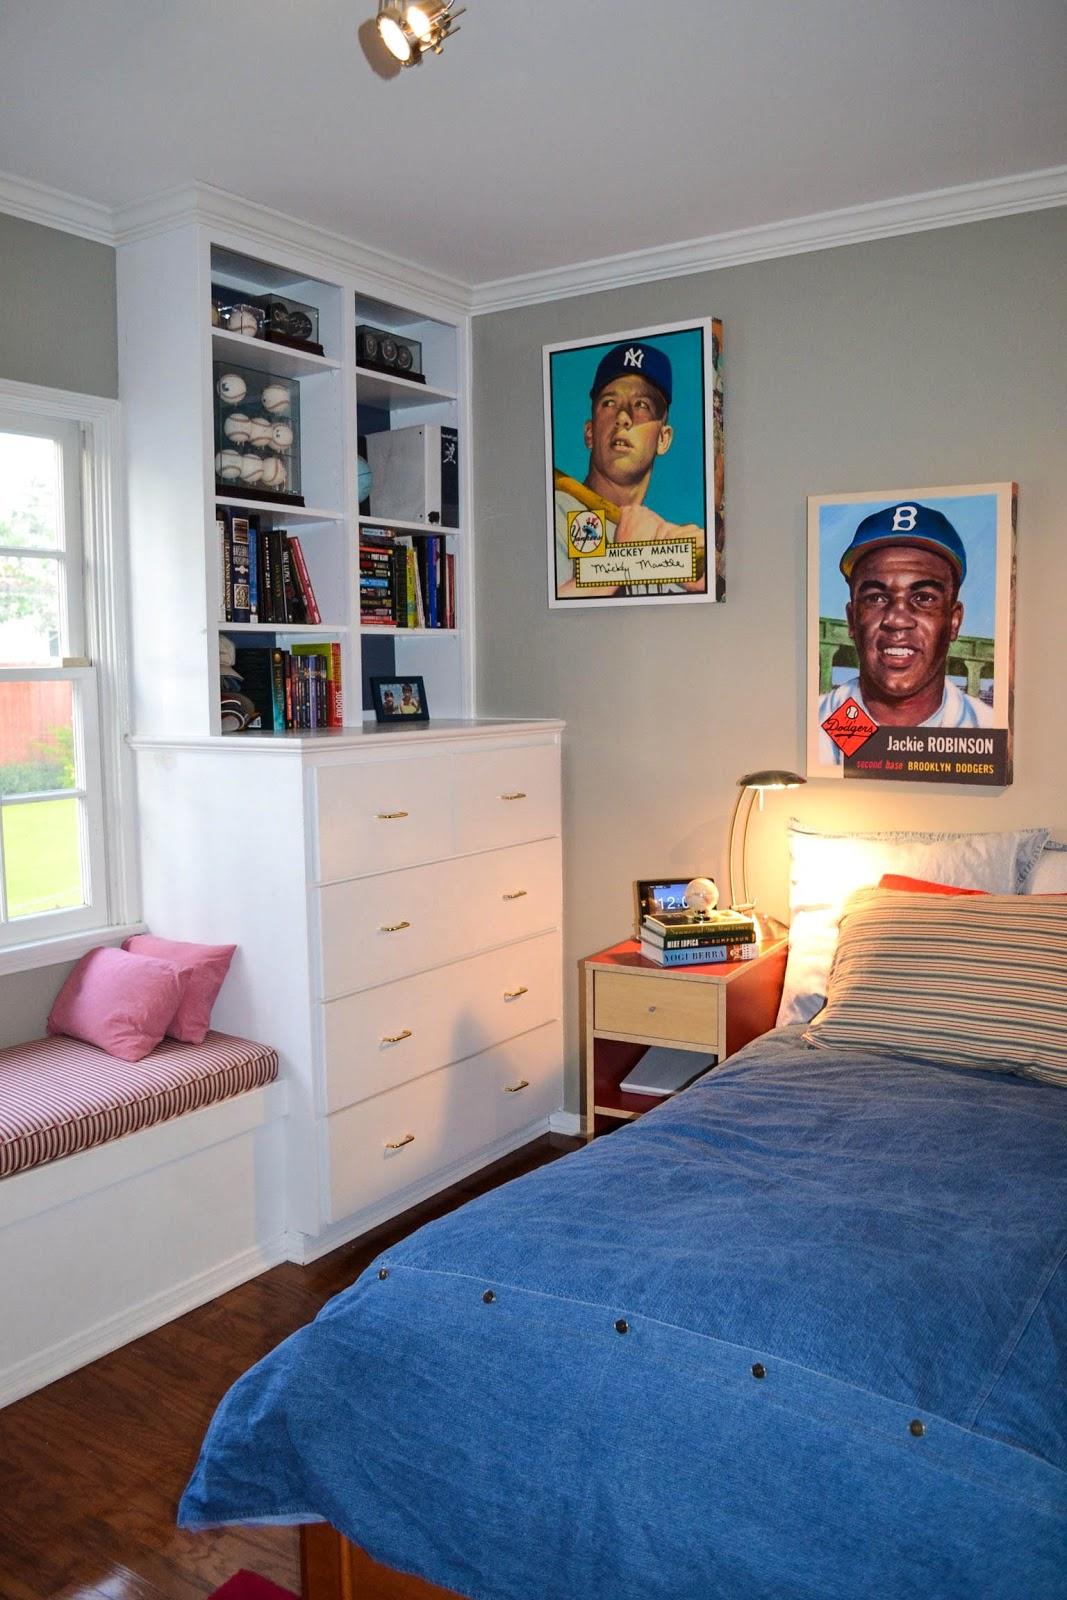 My Teenage Boys Baseball Room Filled With NY Yankees Memorabilia